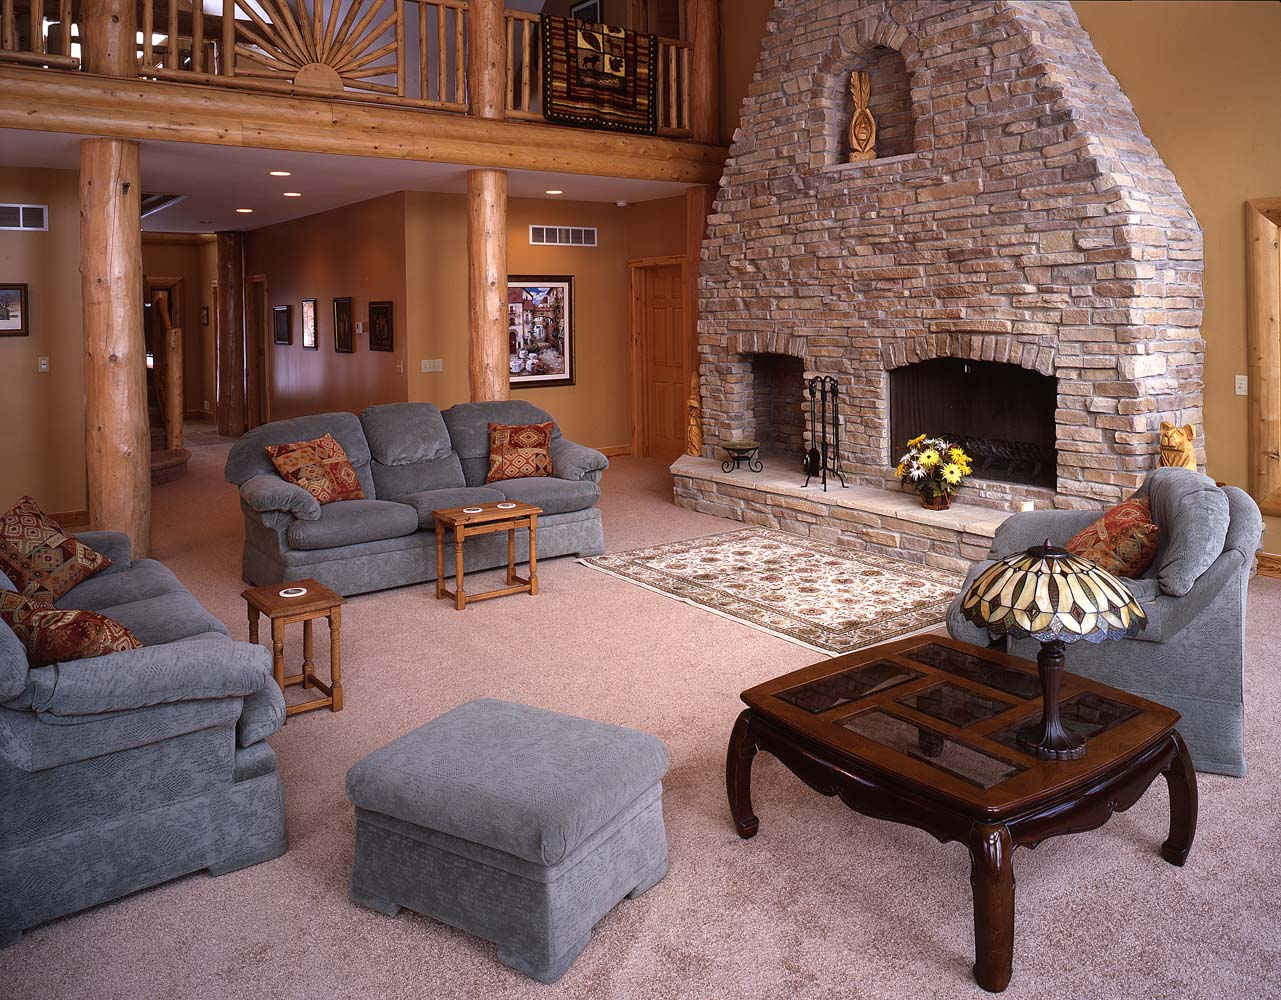 Bev & Mike's House - 6.jpg